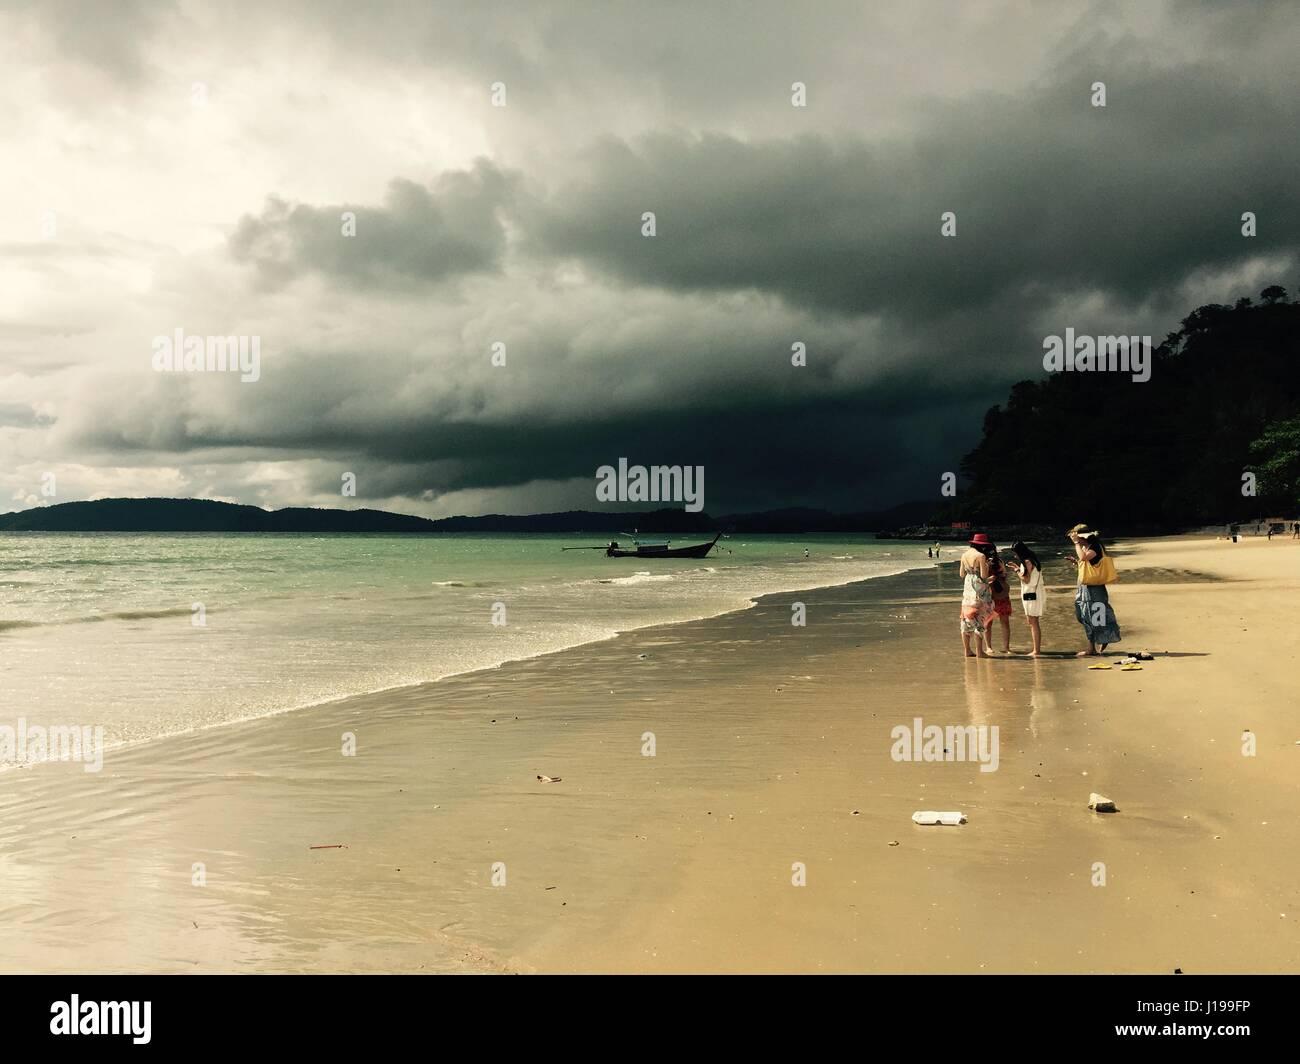 Ladies on a beach under dark skies in Krabi, Thailand. - Stock Image